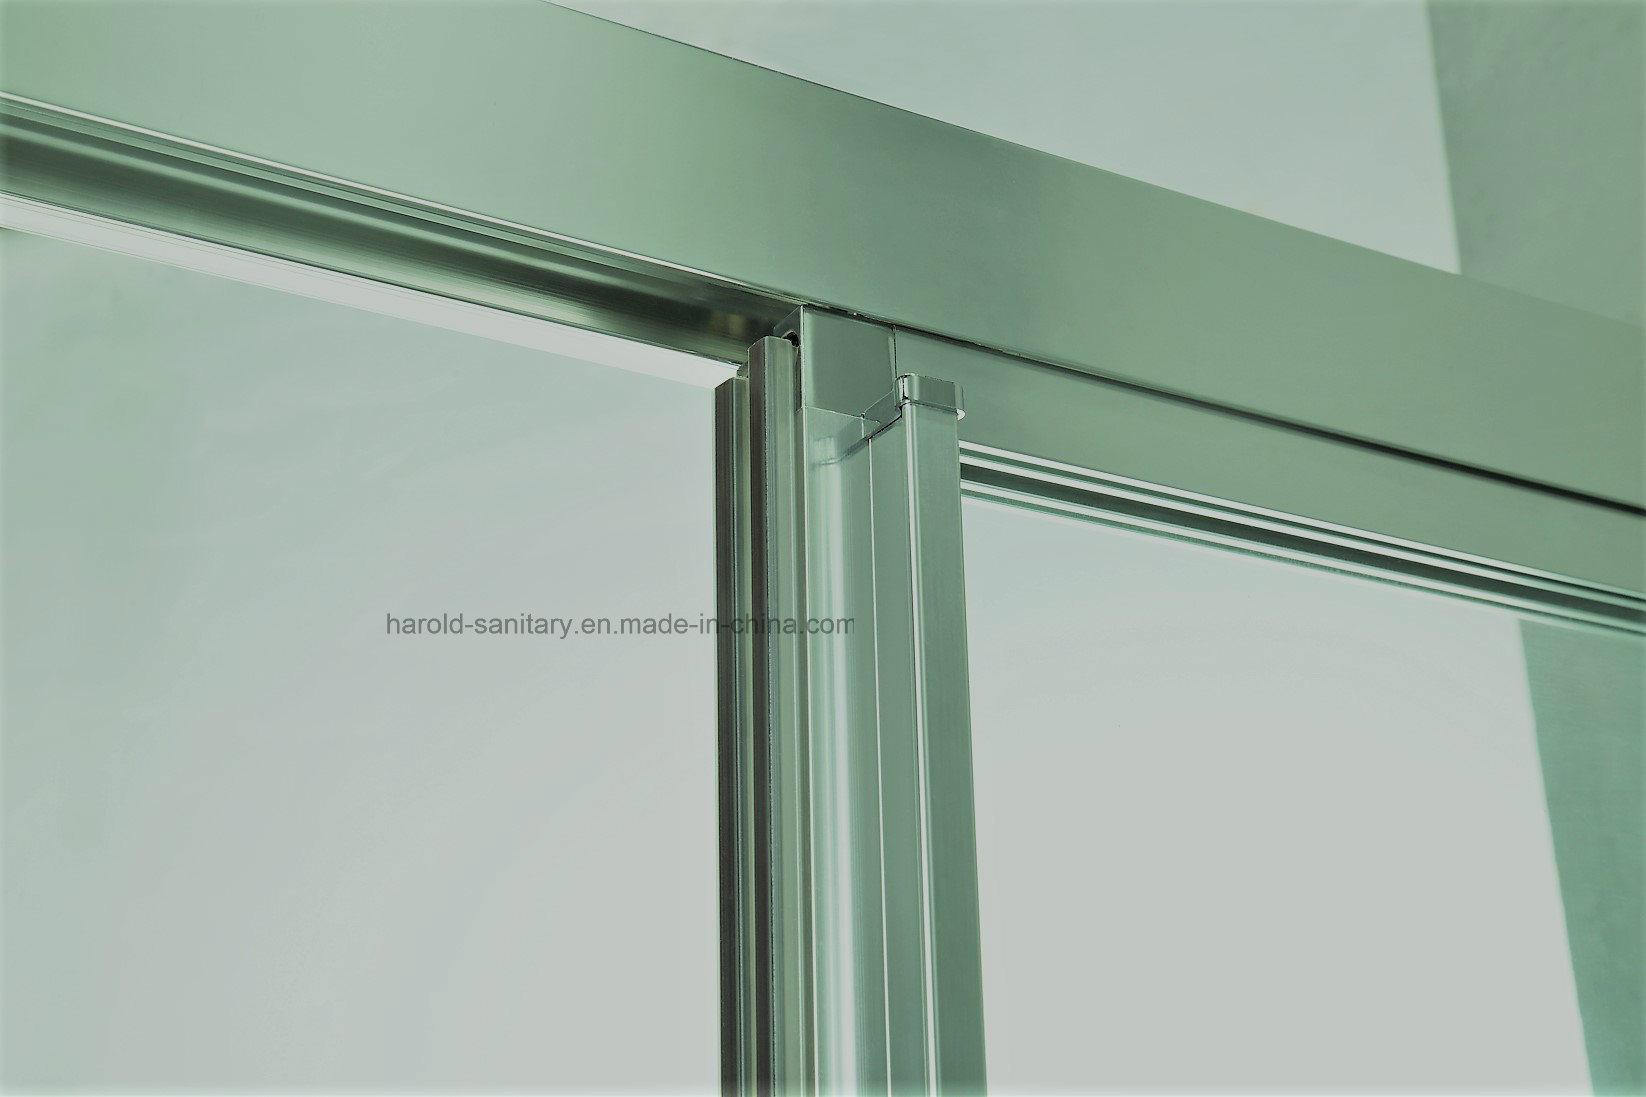 Hr-P035-D Aluminum Profile Handle Straight 2 Panels Shower Door